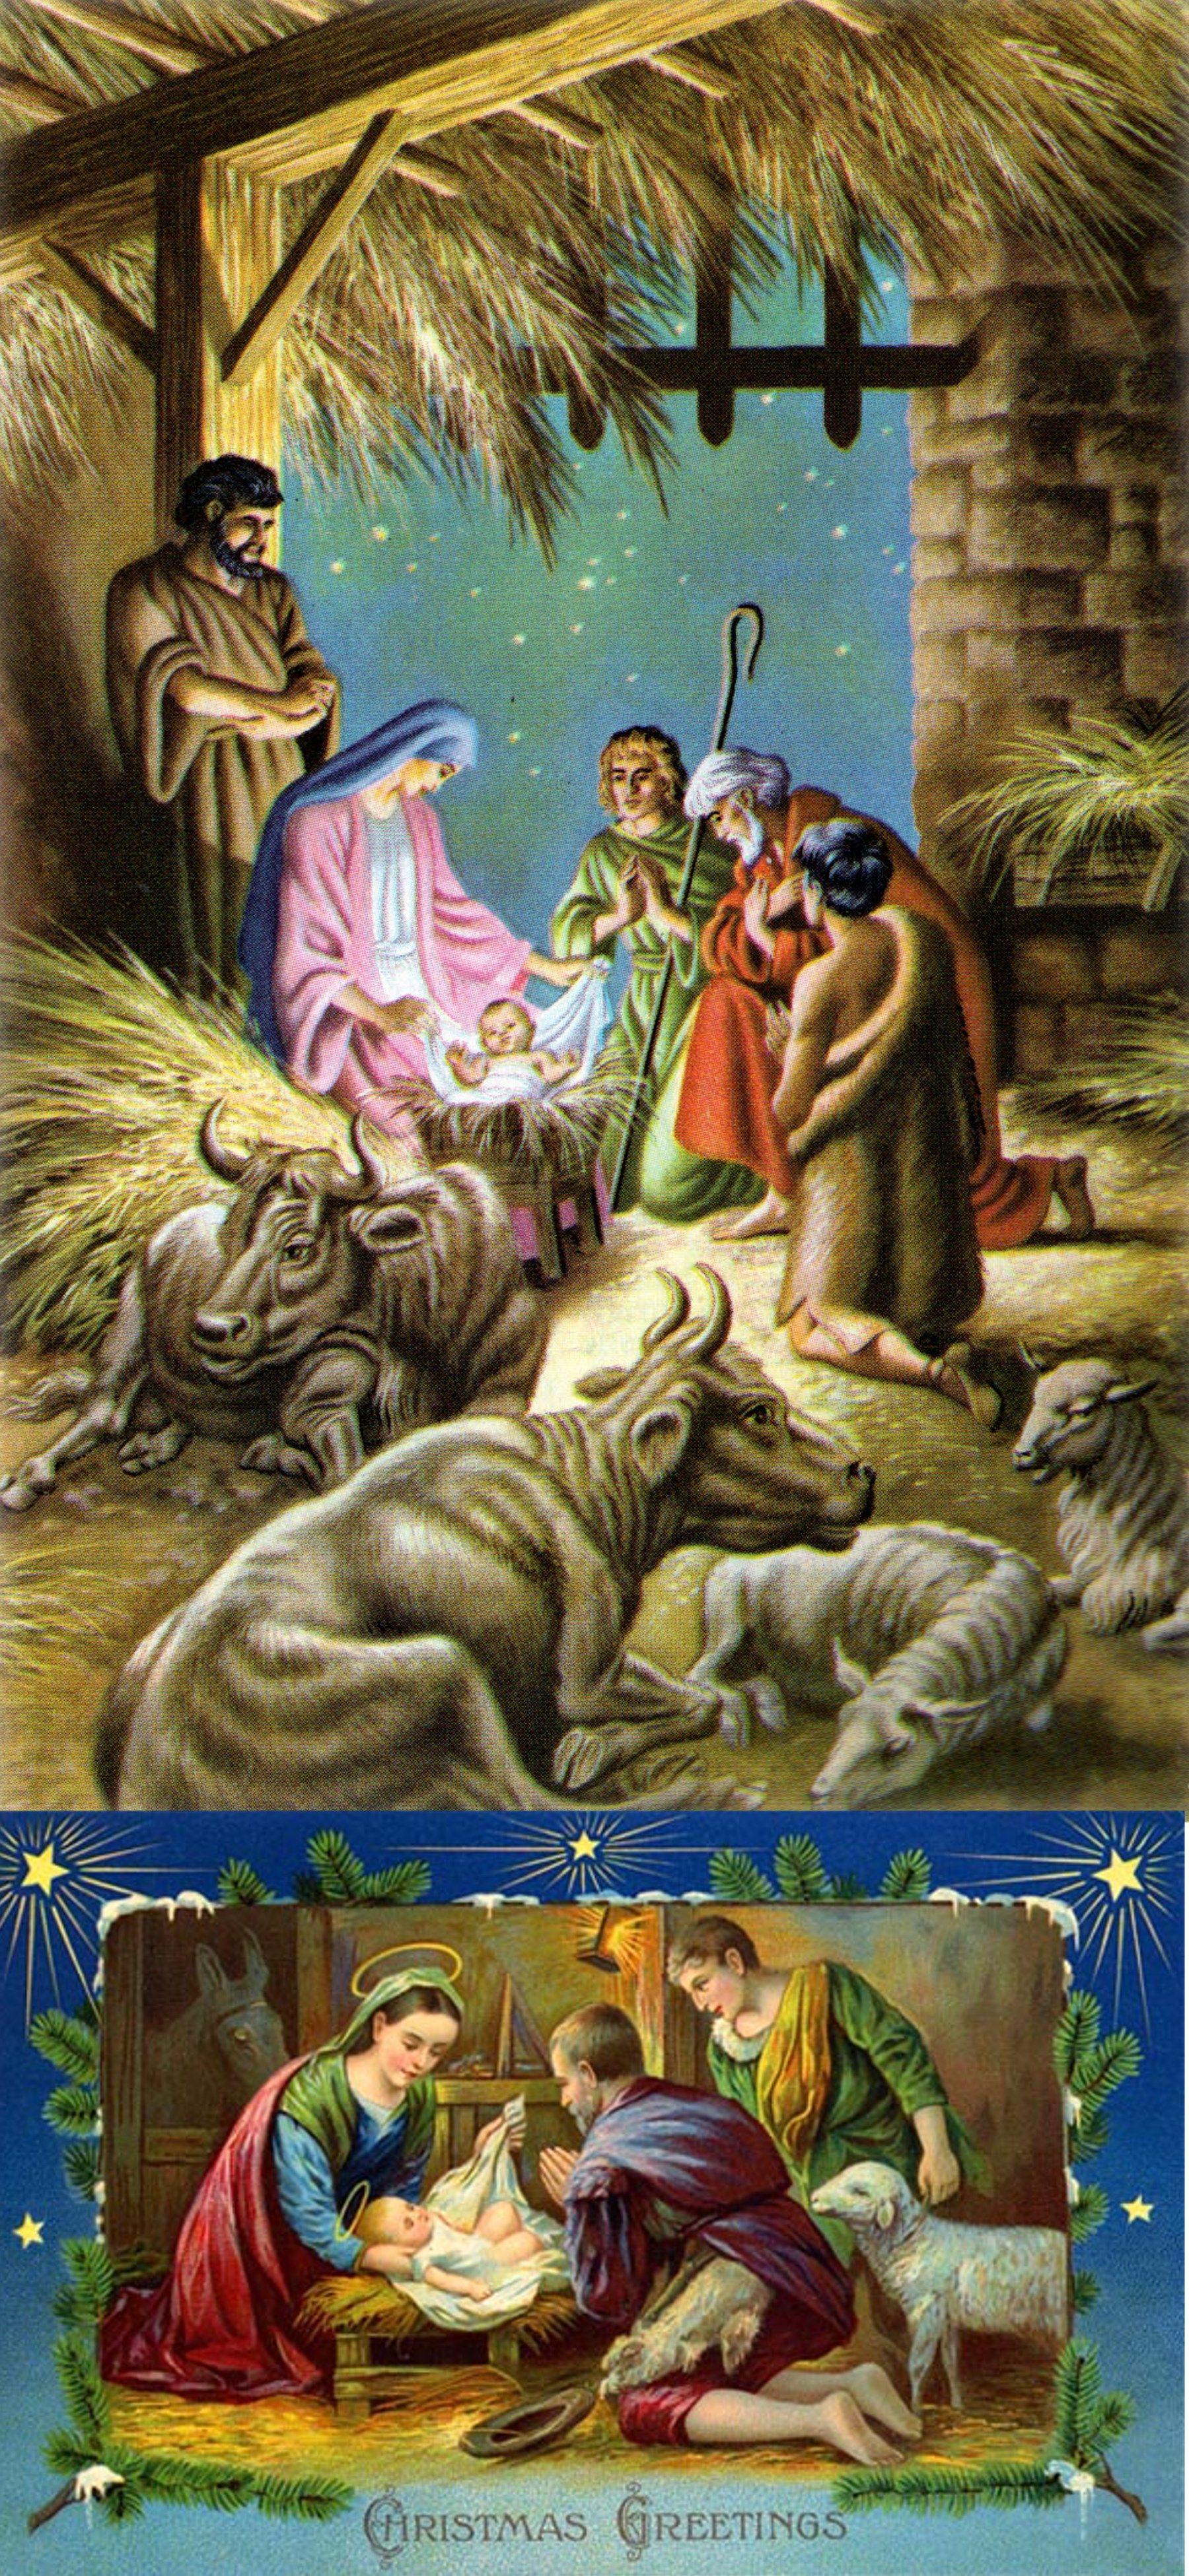 Vintage Nativity Christmas Cards Holiday's Christmas